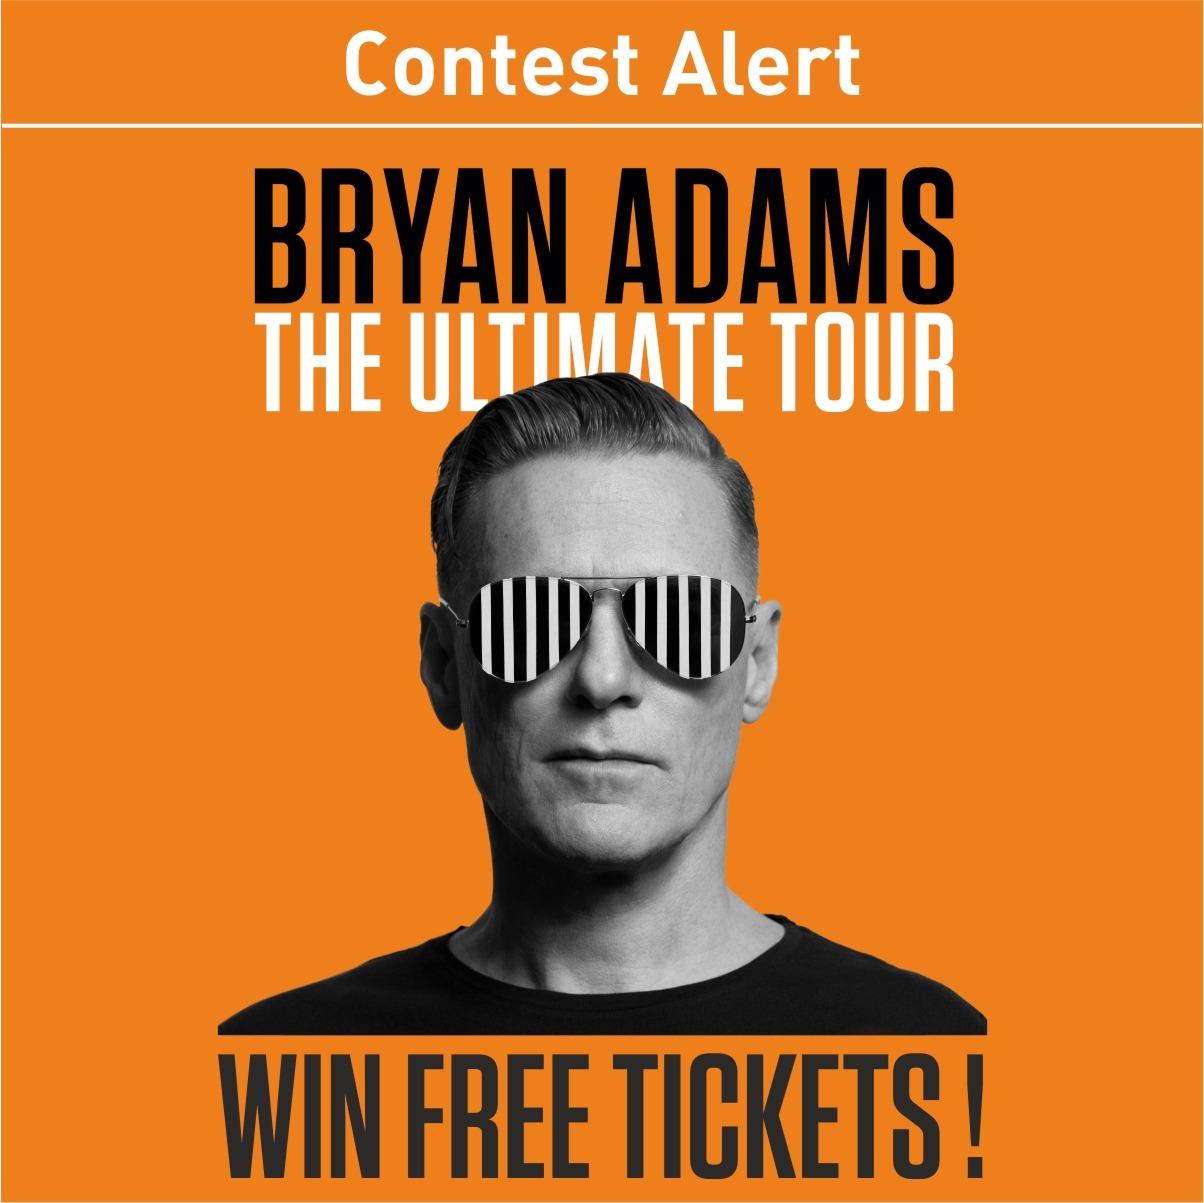 Photo Contest Alert: Win free tickets to Bryan Adams